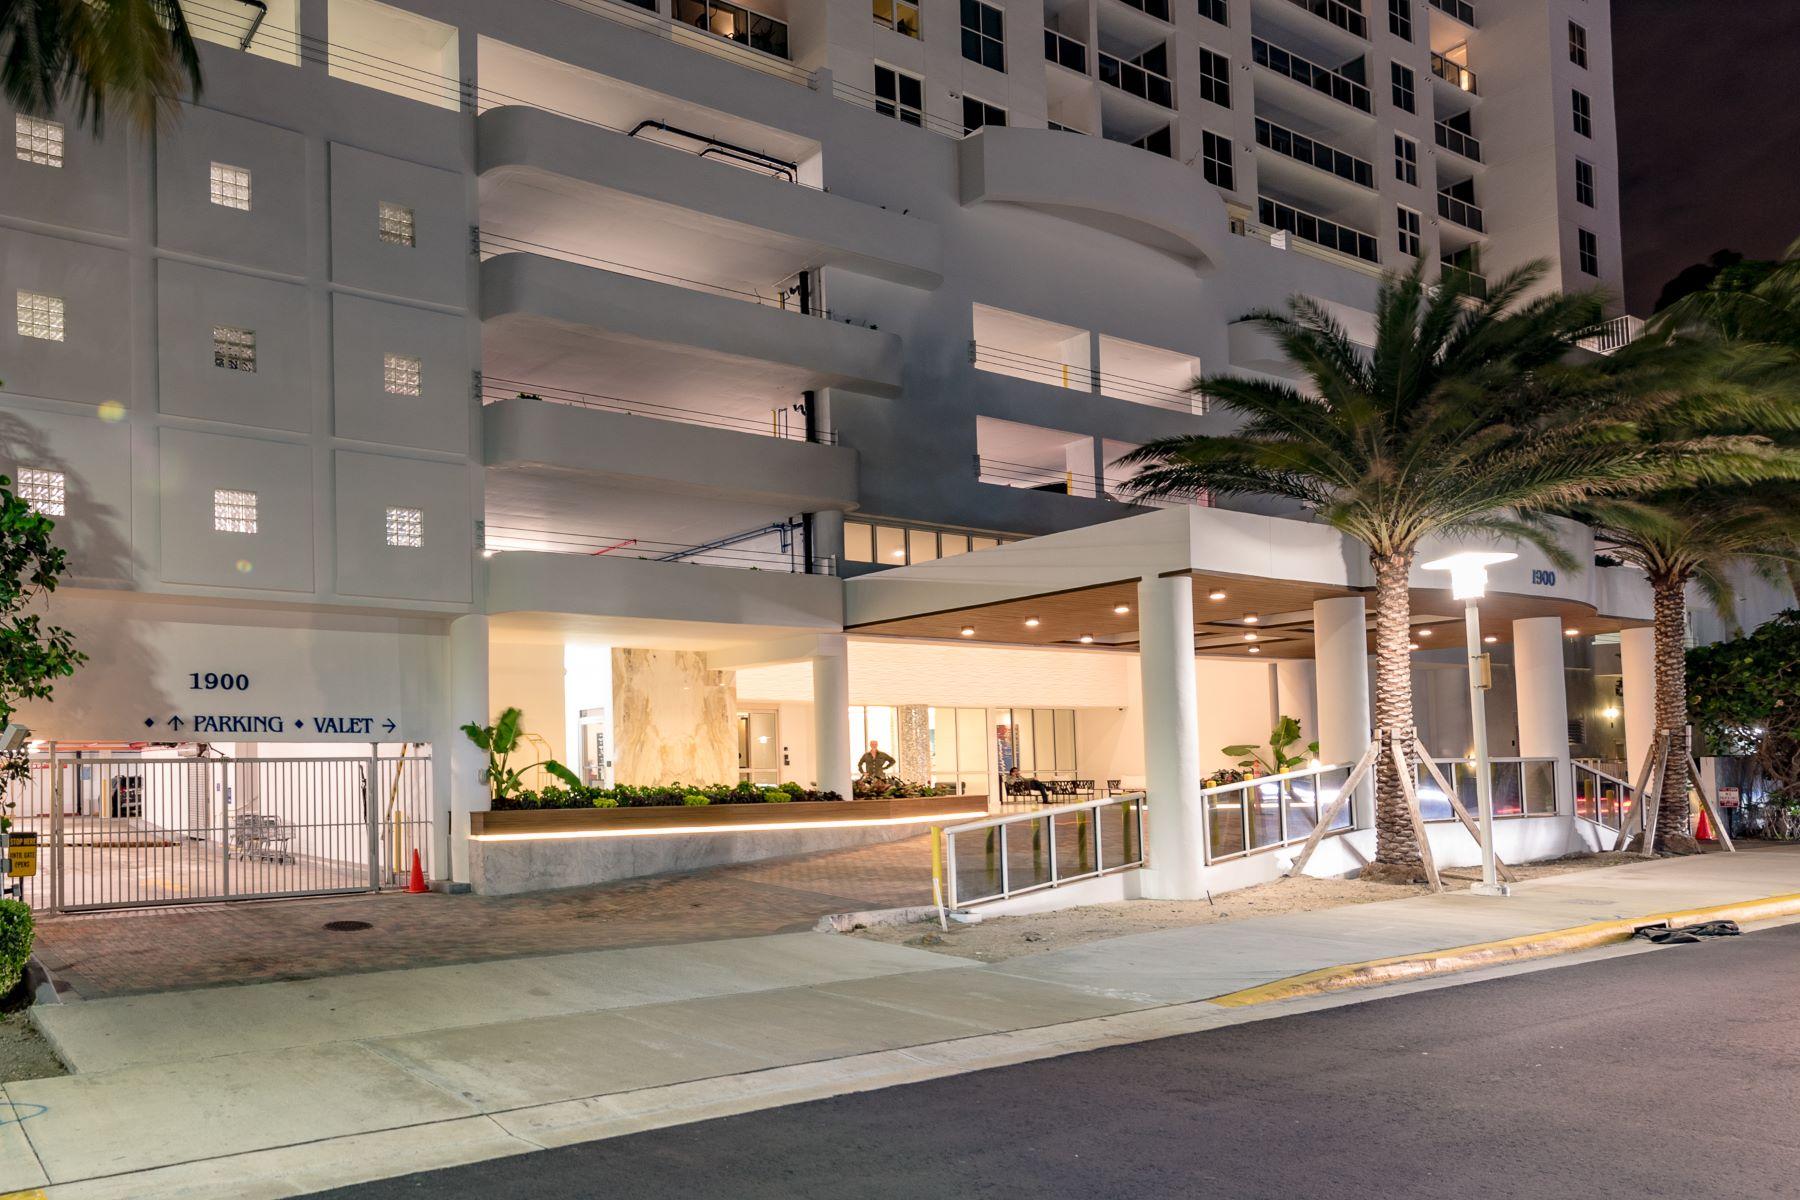 Condominium for Sale at 1900 Sunset Harbour Dr #2009 1900 Sunset Harbour Dr 2009 Miami Beach, Florida, 33139 United States